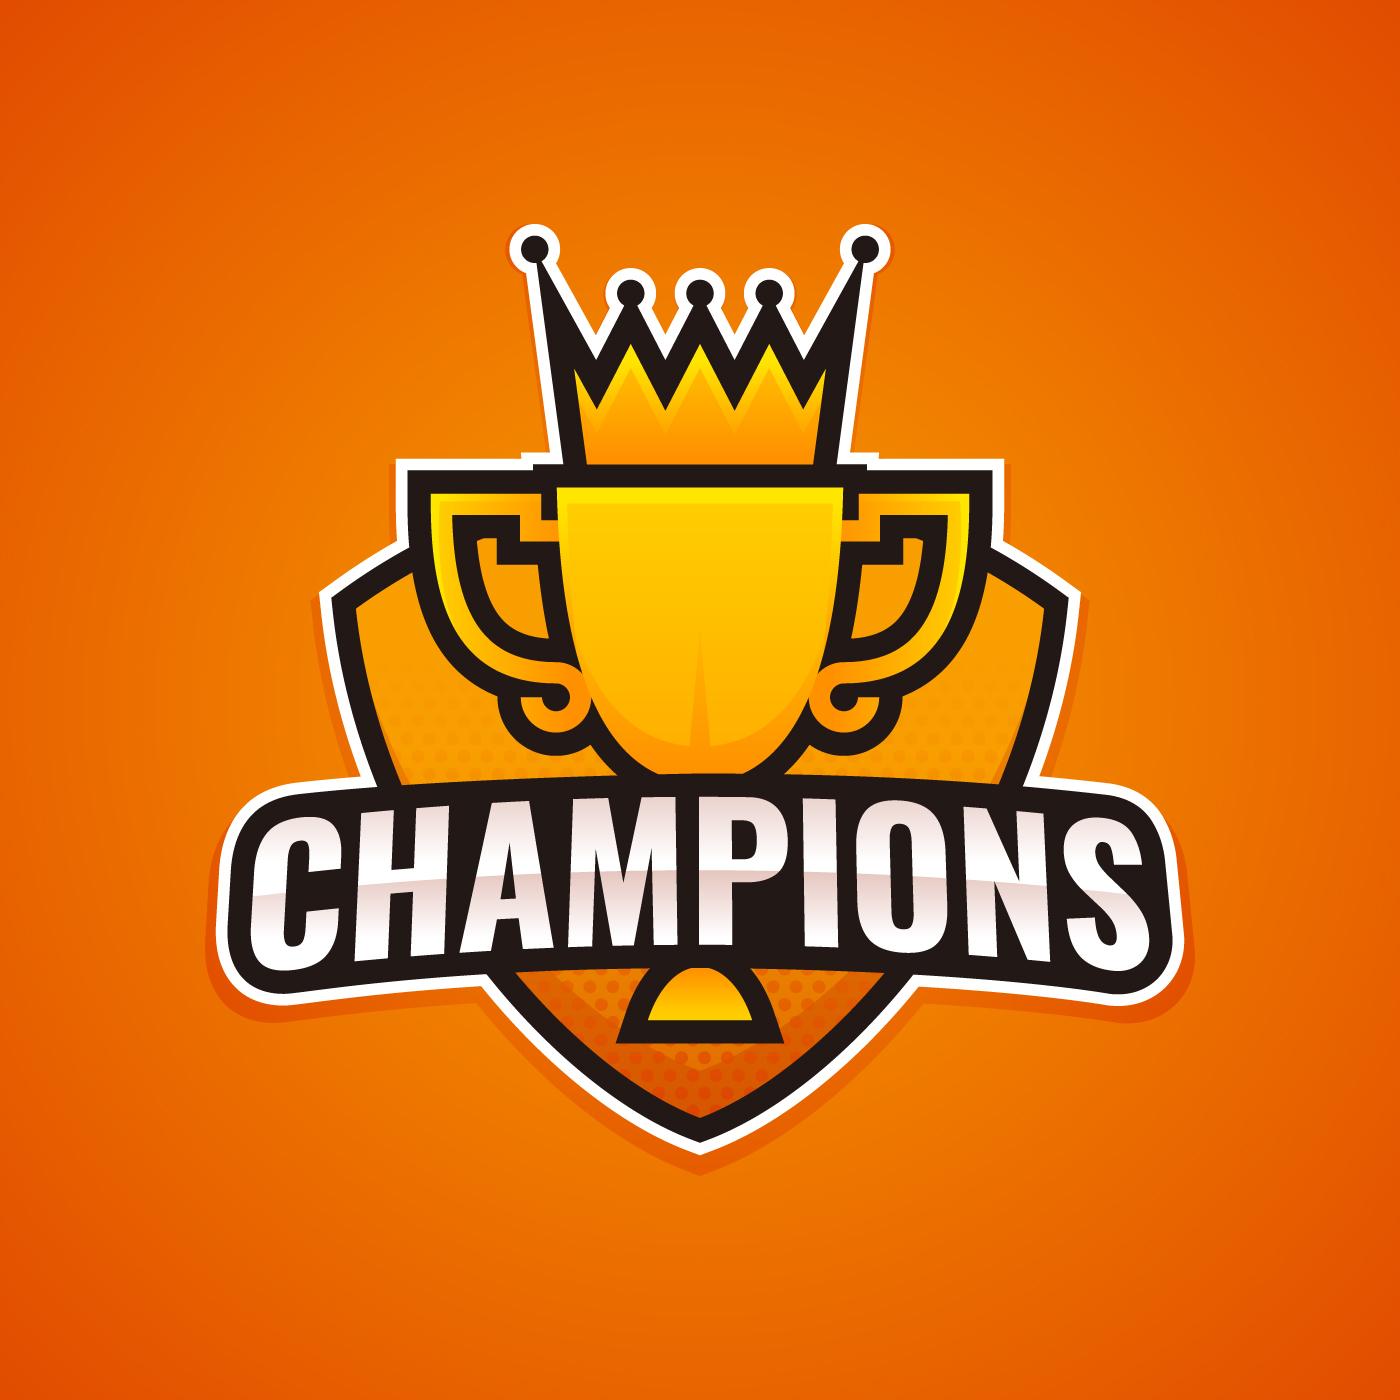 Champions League Vector: Champions League Sports Logo